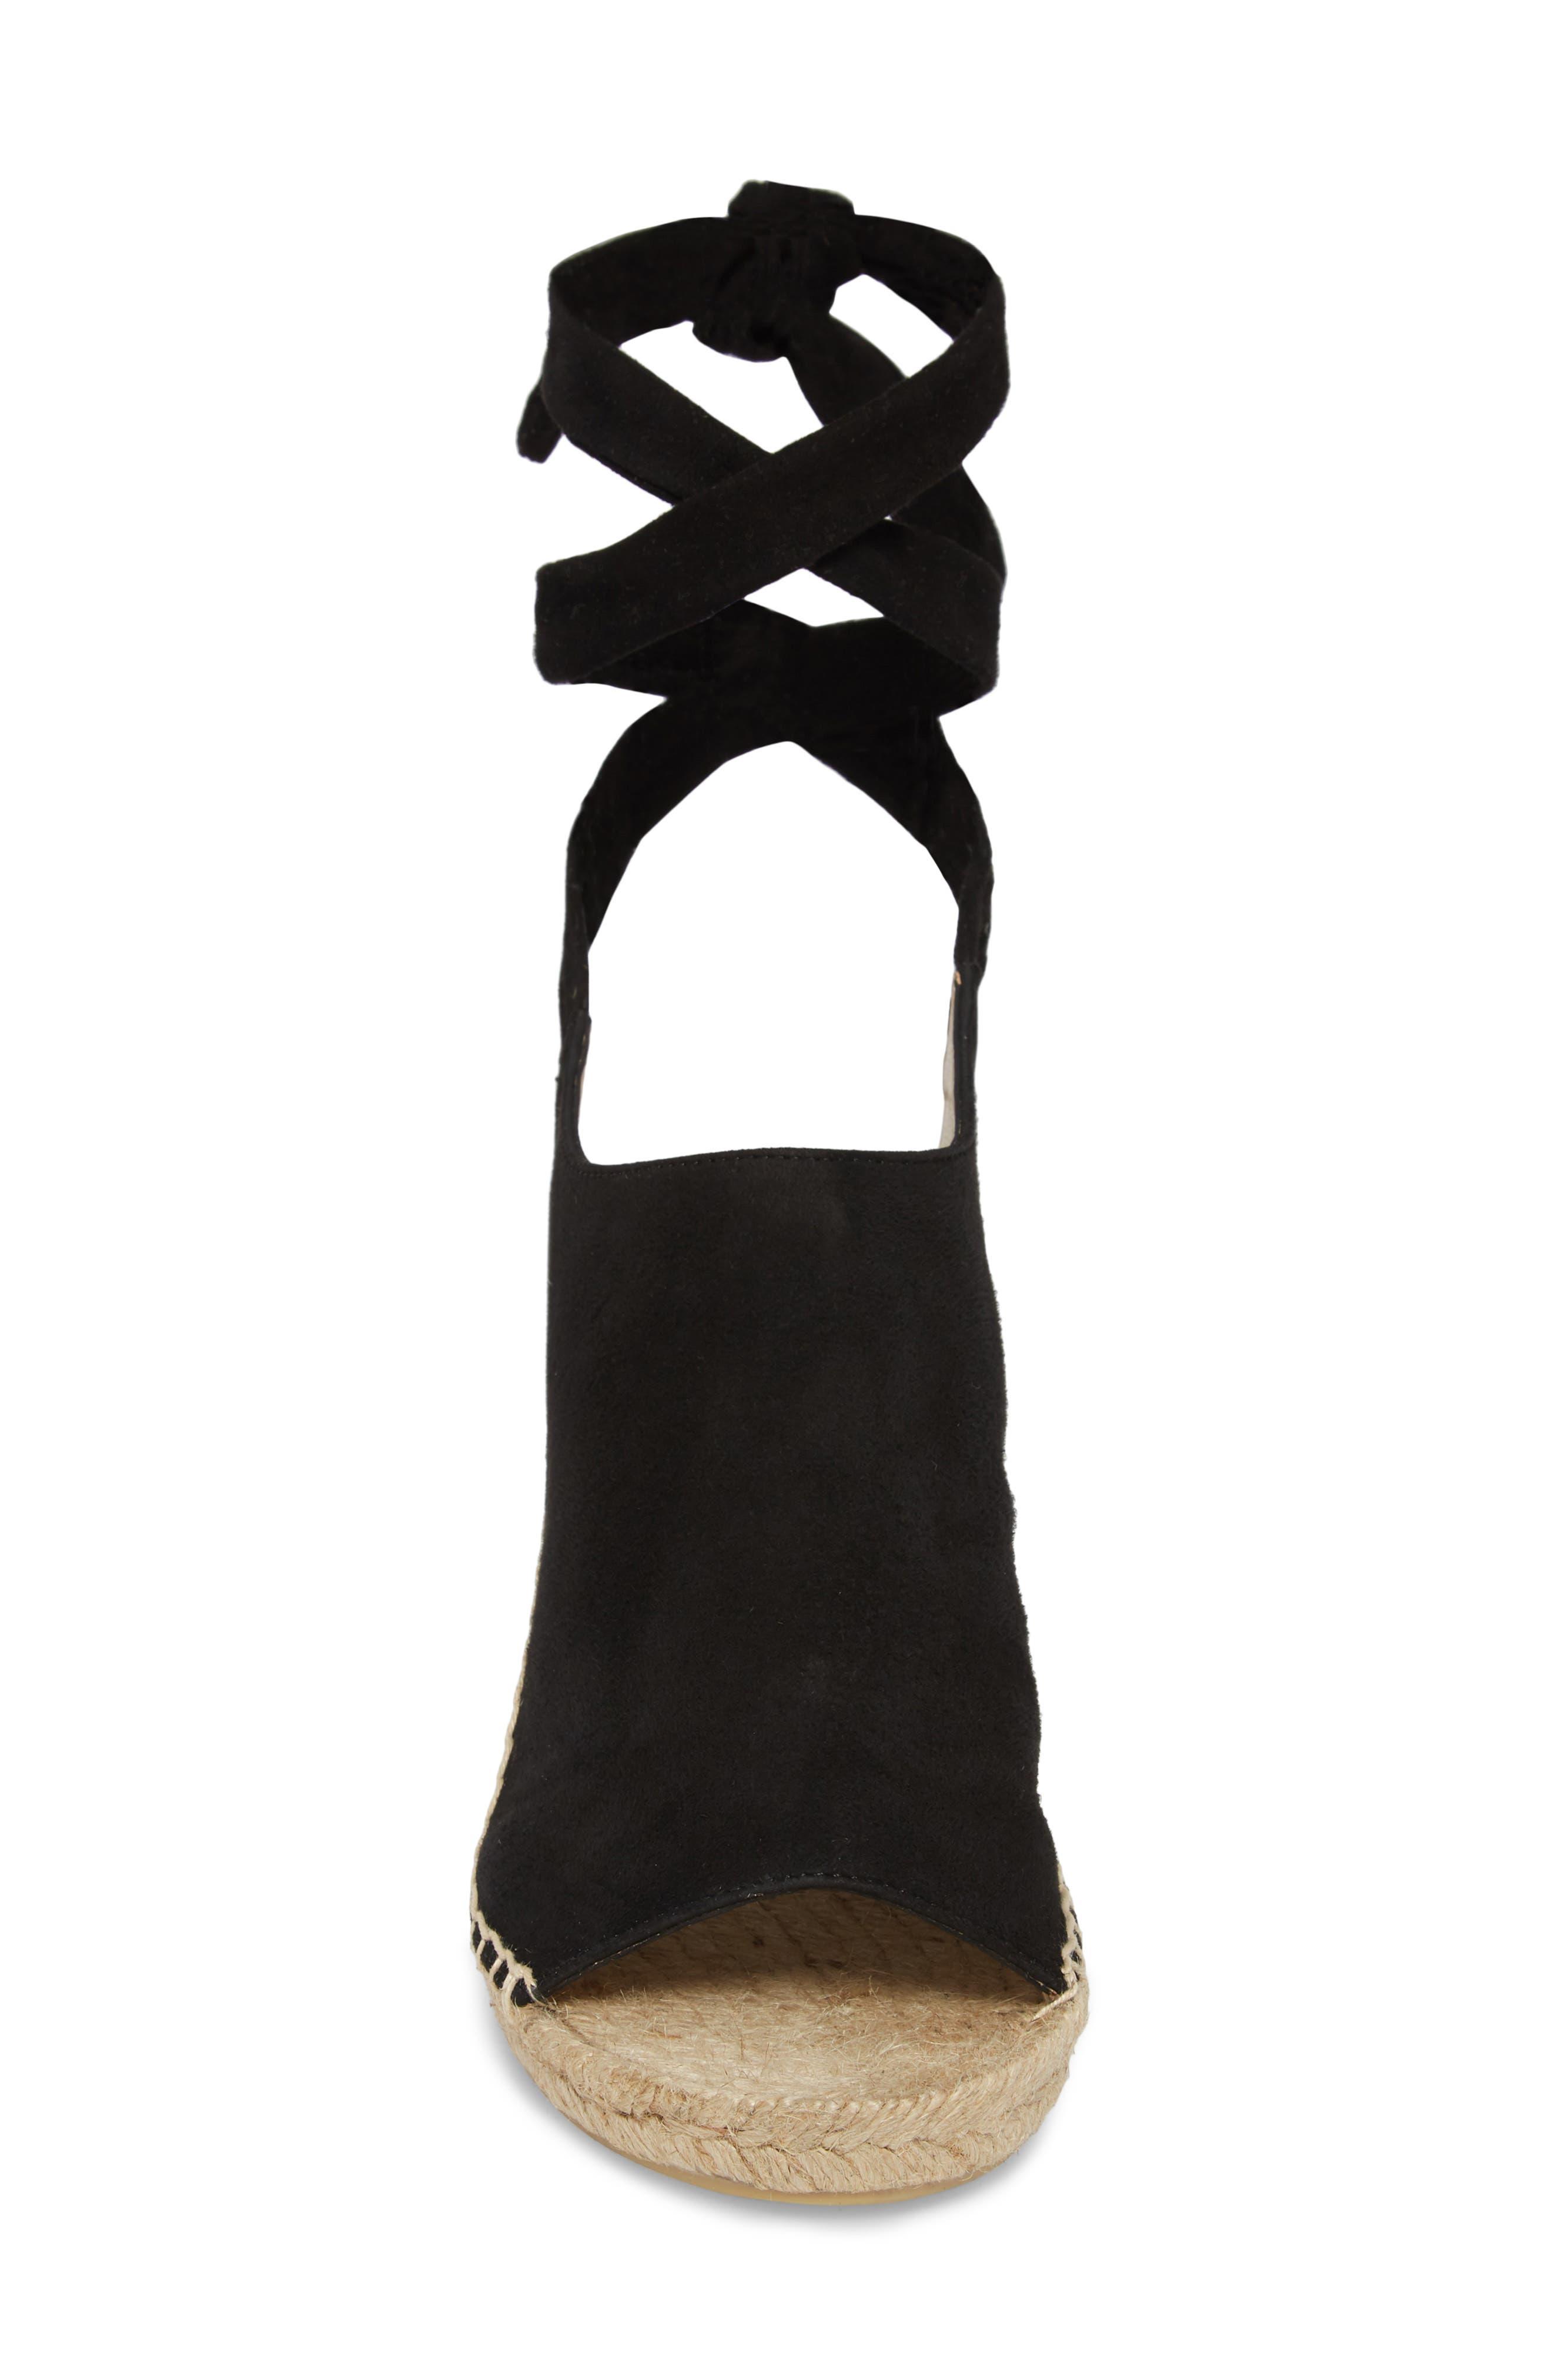 Vie Espadrille Wedge Sandal,                             Alternate thumbnail 4, color,                             Black Suede